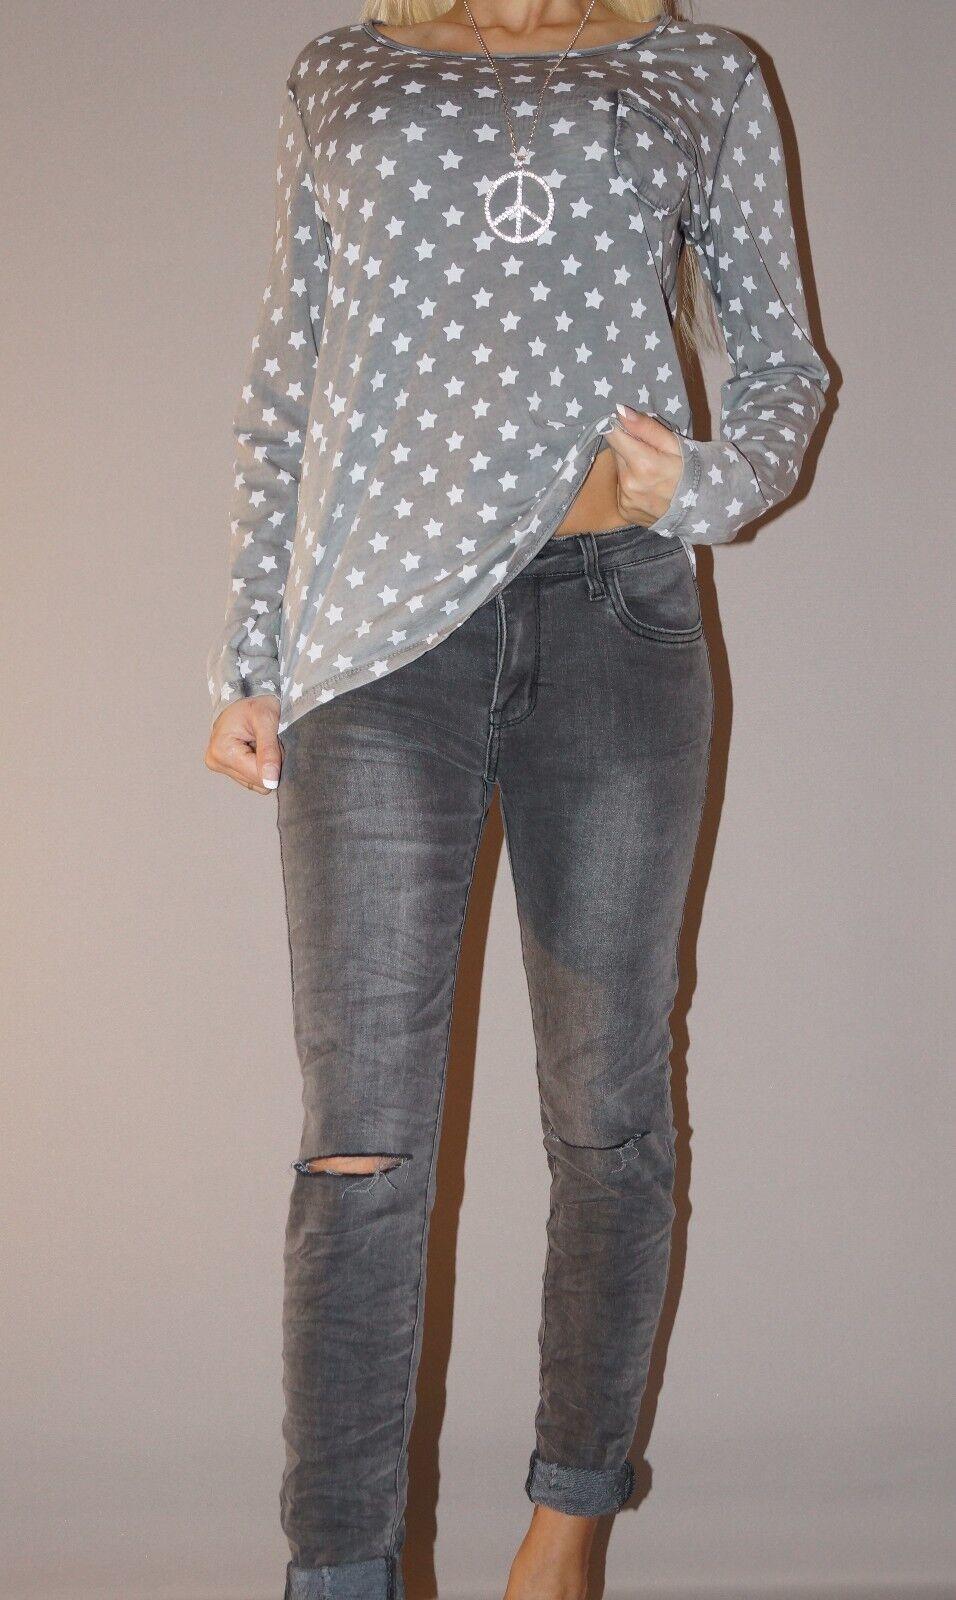 NEU Skinny Jeans Vintage Sexy Blogger Hose Ripped Knees S 36 Grau Anthrazit